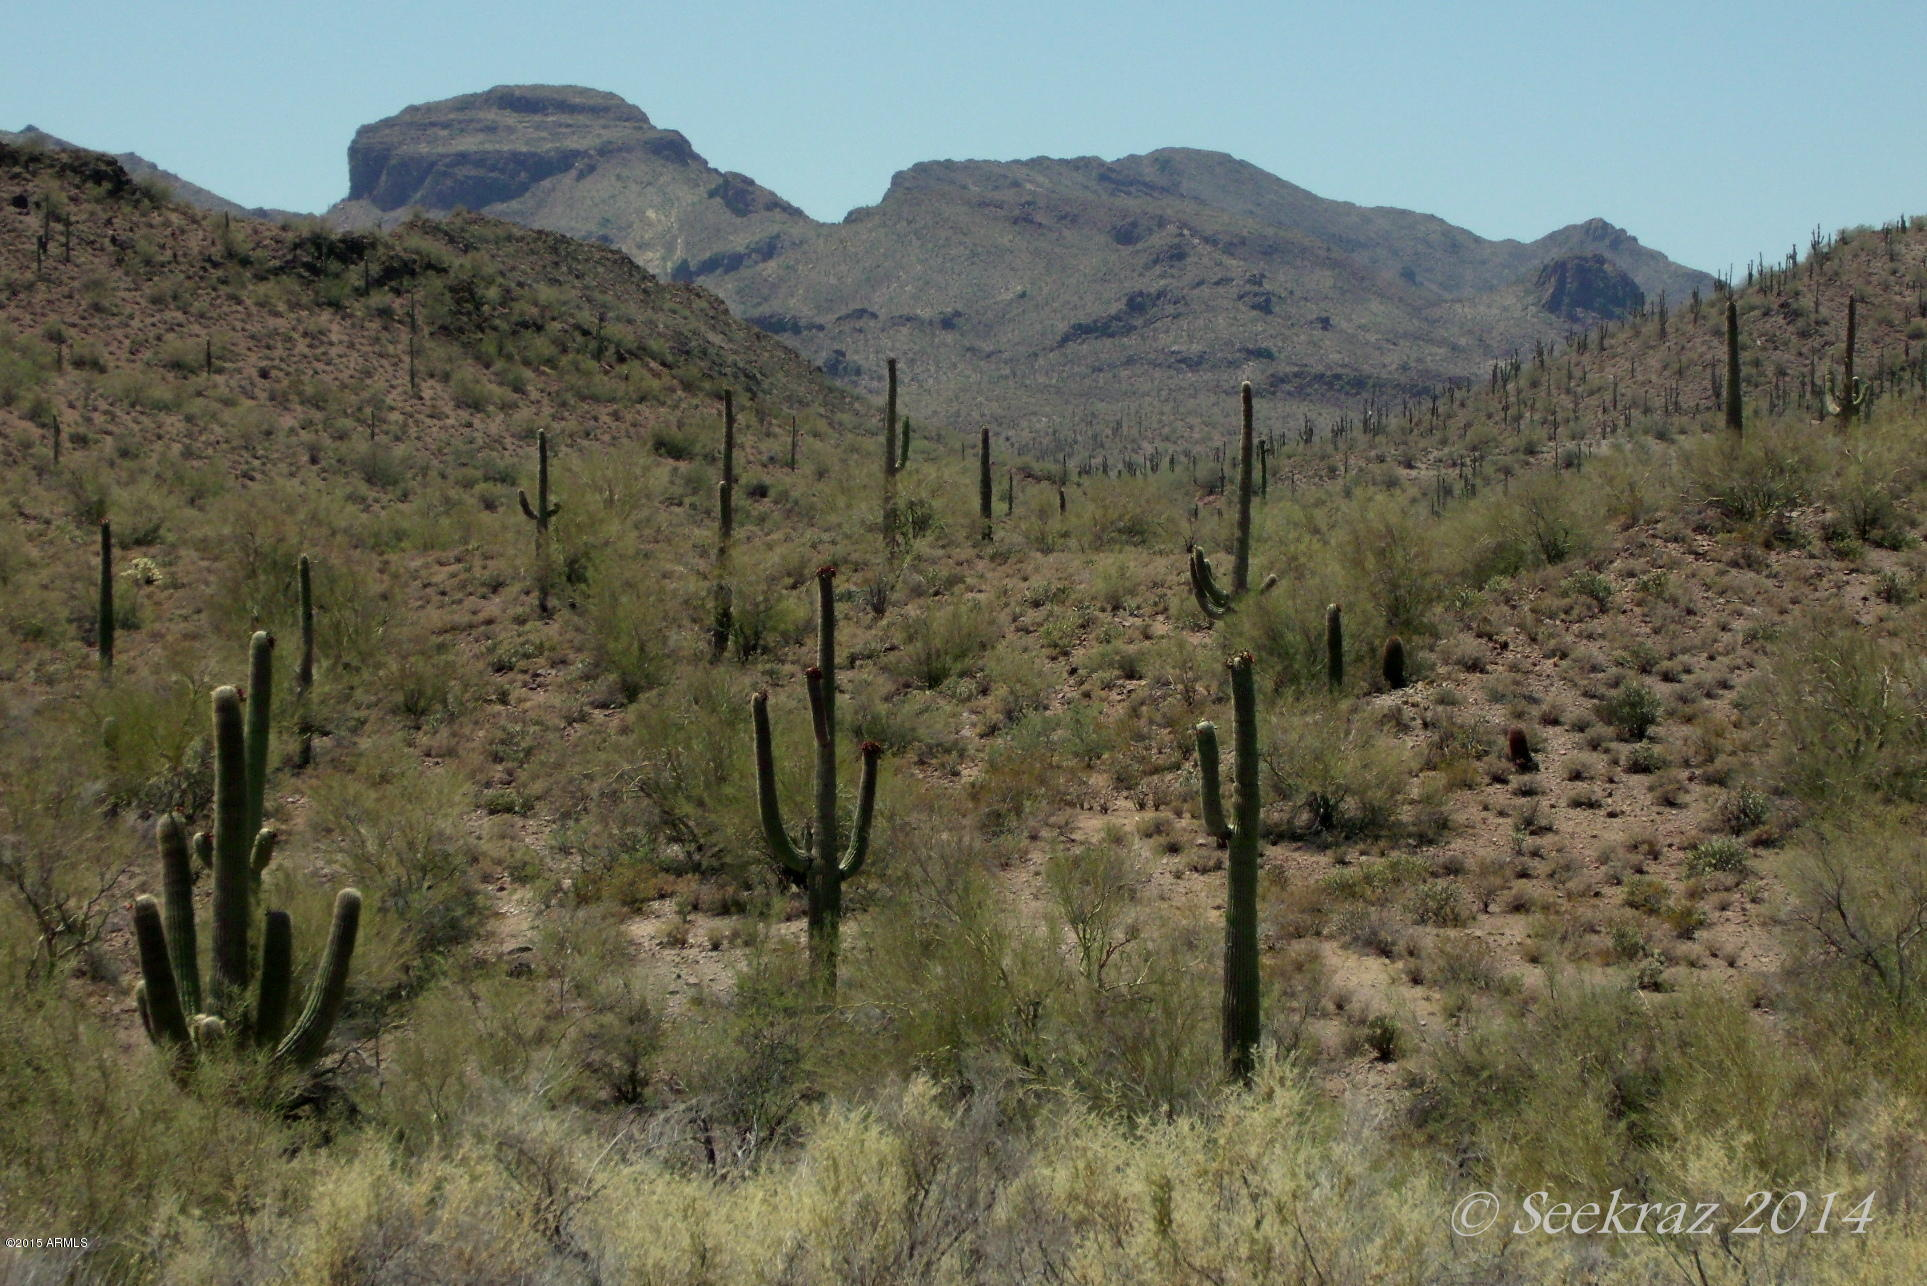 0 N Cow Creek Road Morristown, AZ 85342 - MLS #: 5261853